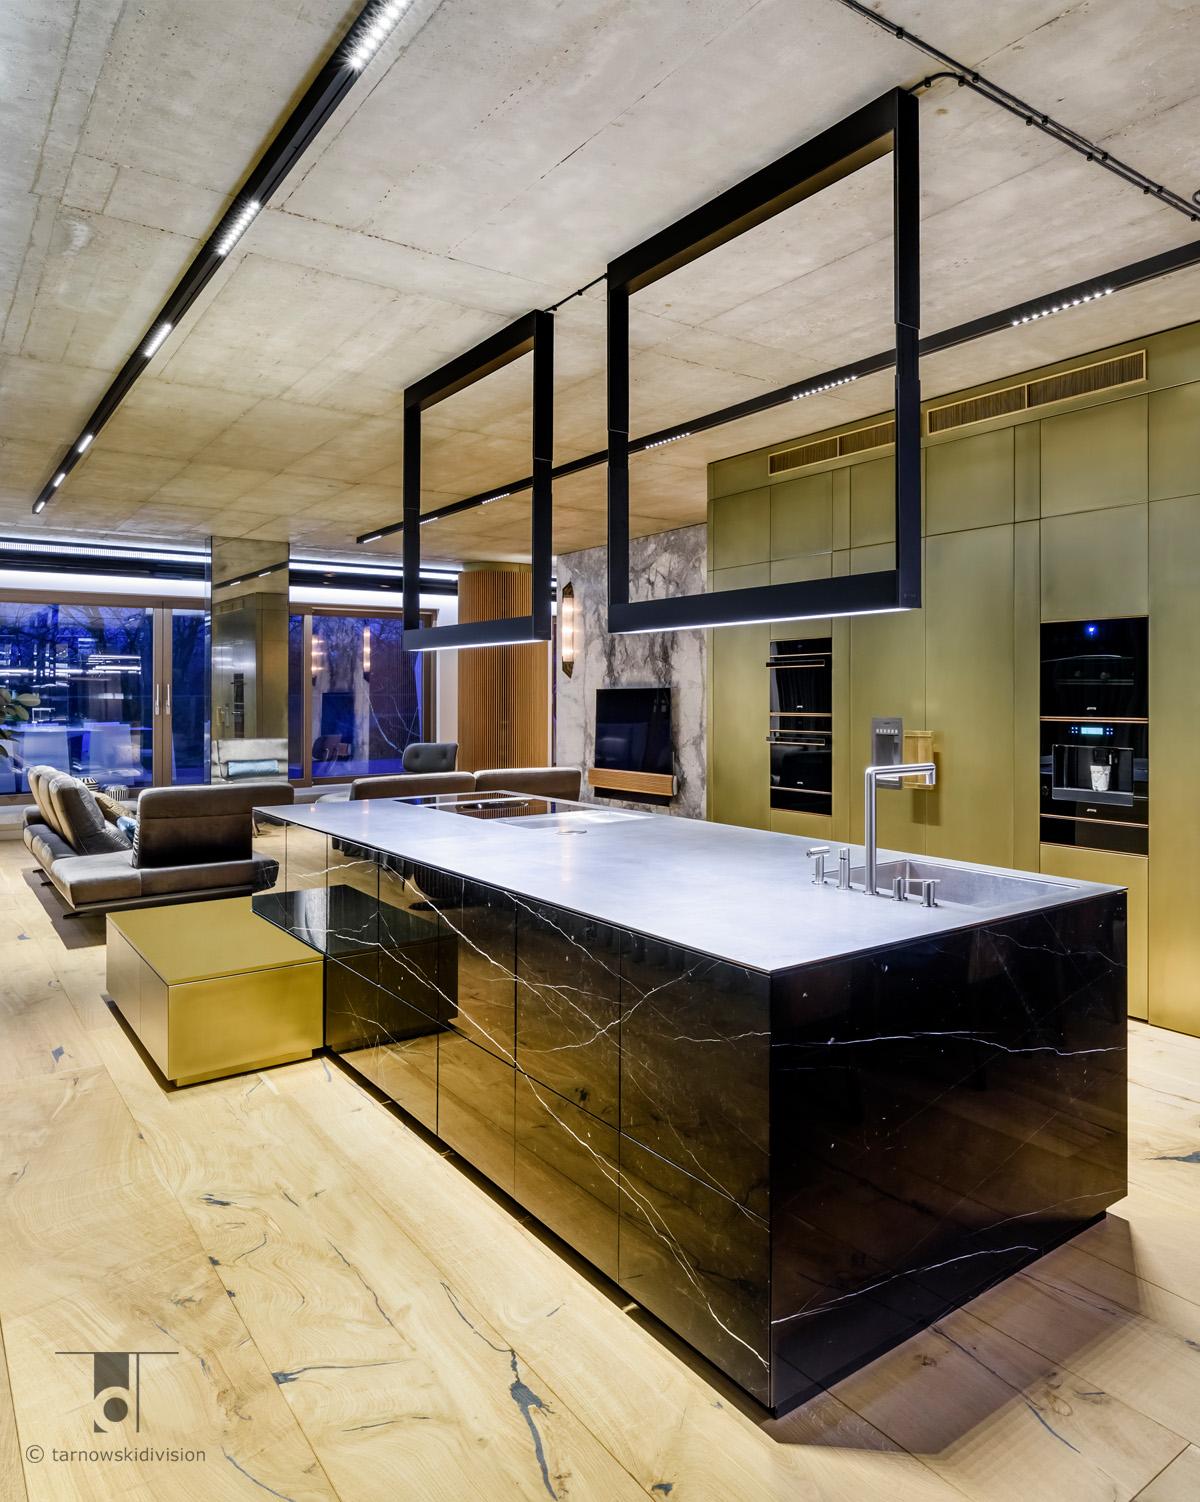 ekskluzywna kuchnia nowoczesna kamienna wyspa kuchenna z kamienia projekt kuchni marble kitchen island design_tarnowski division